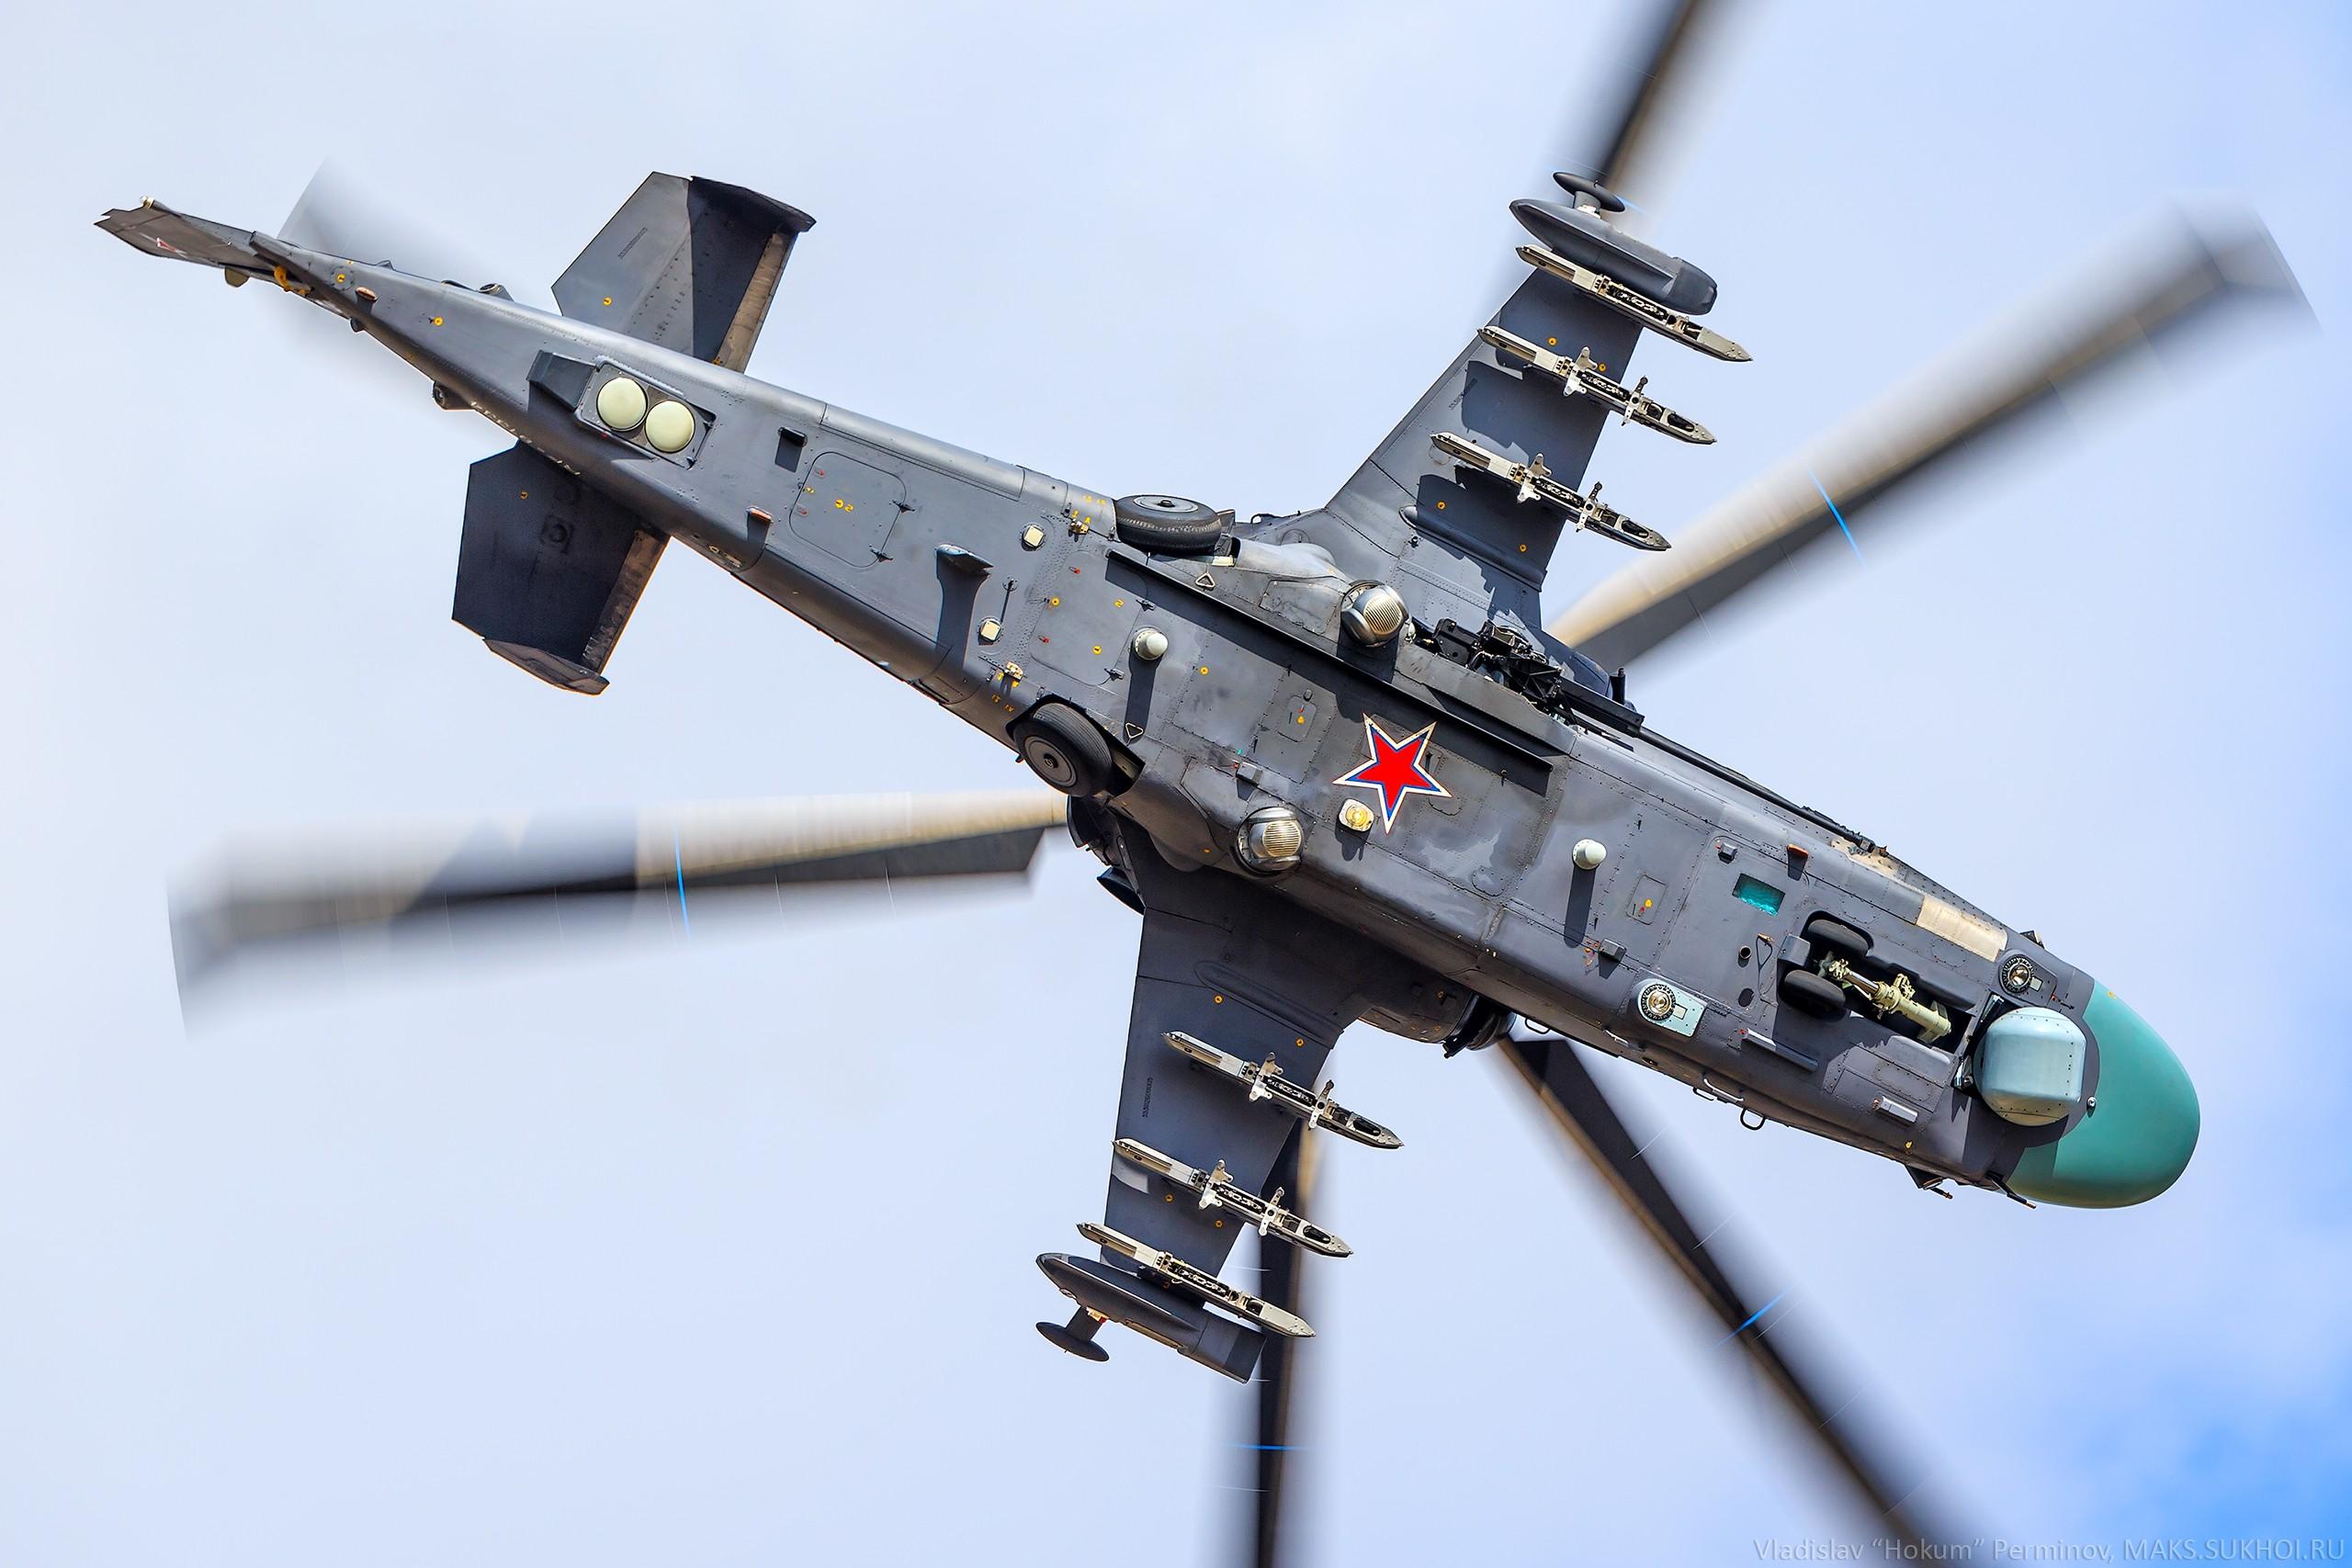 2560x1707 Px Aircraft Army Kamov Ka 52 Military Russian